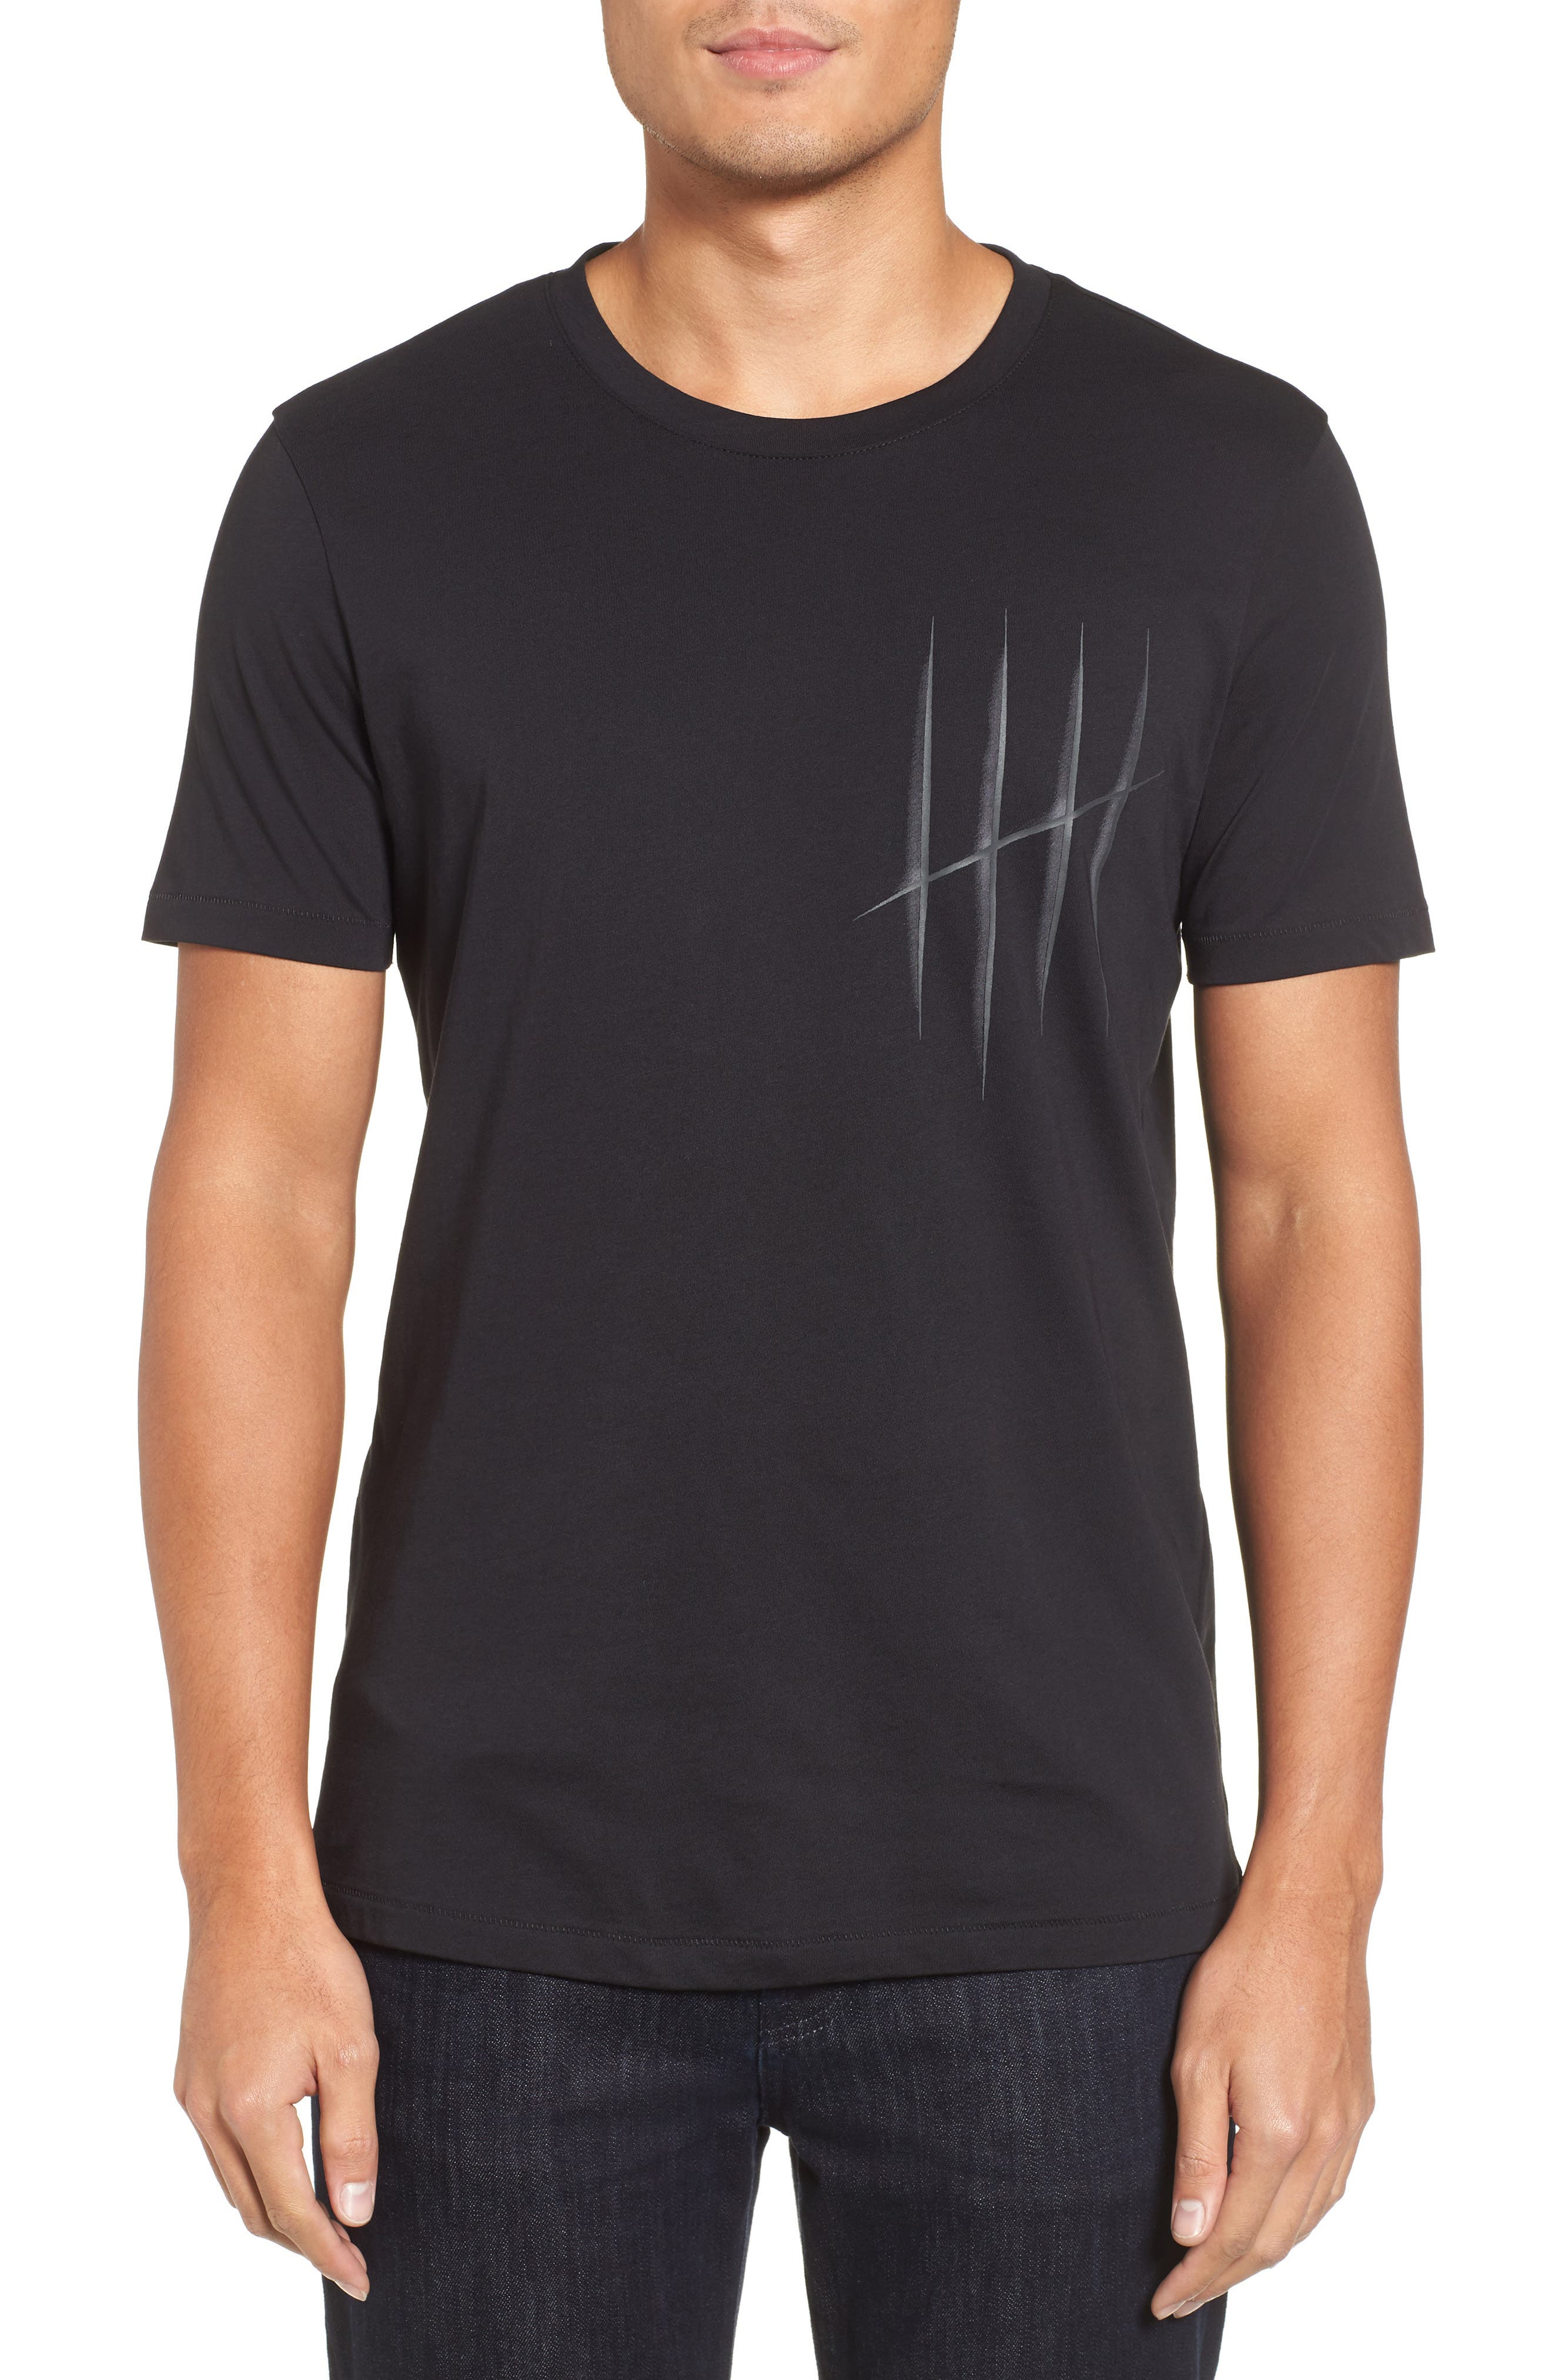 Hugo Boss Drison Hashmark Graphic T-Shirt,                             Main thumbnail 1, color,